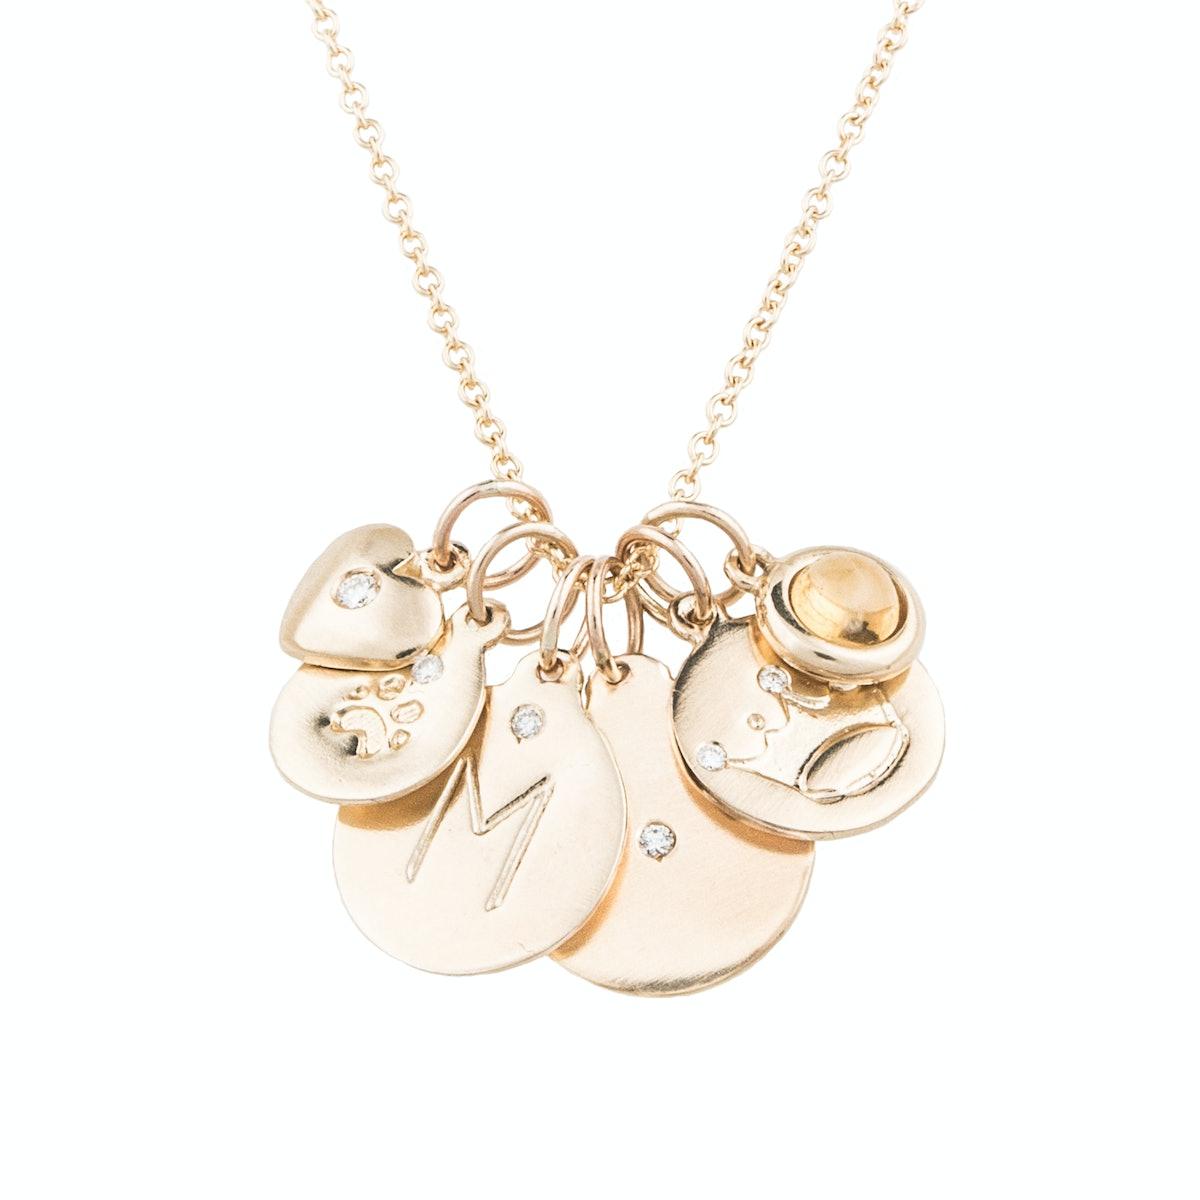 Helen Ficalora 14k gold Essential charm necklace